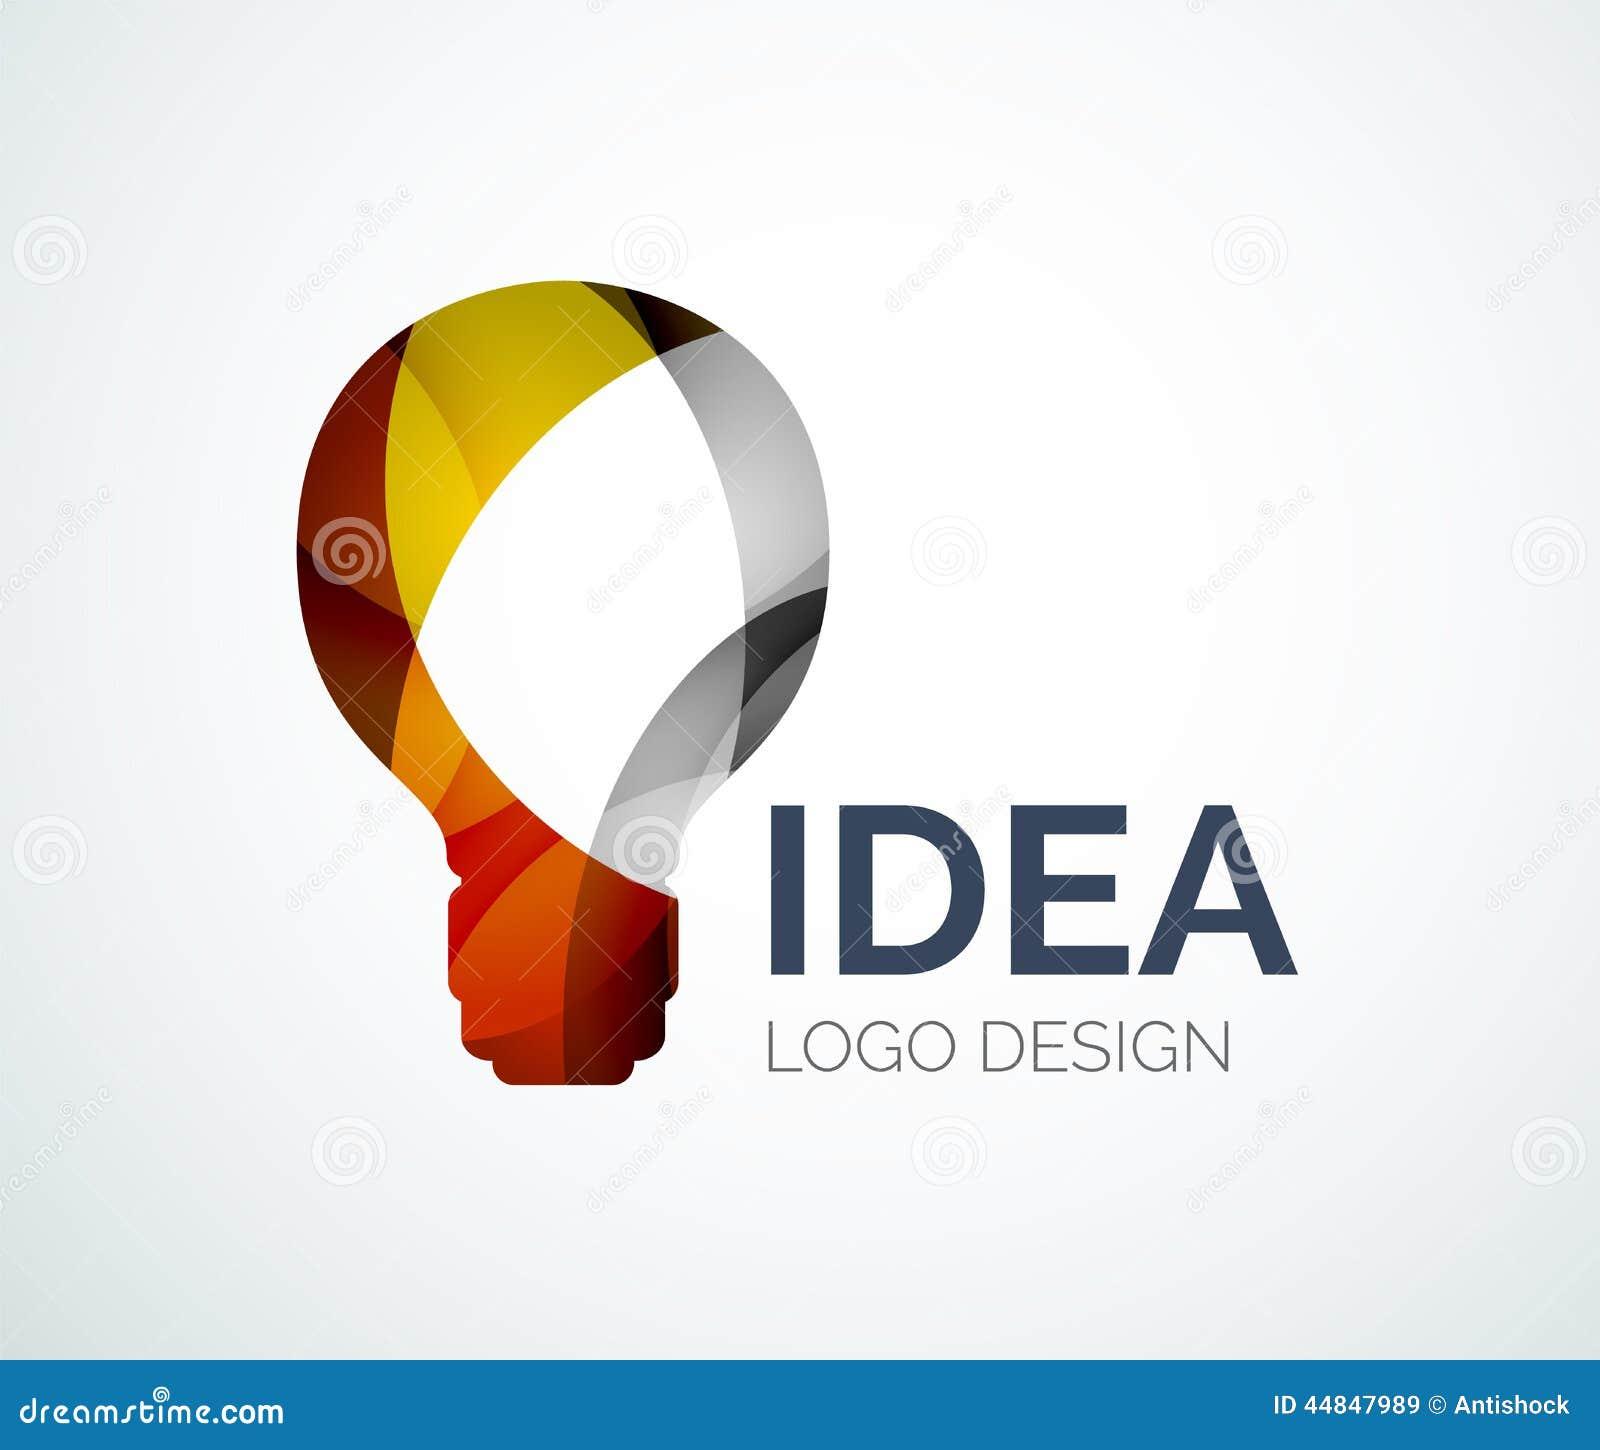 Cymk Puzzle Light Bulb Logo Design Made Of Color Pieces Stock Vector